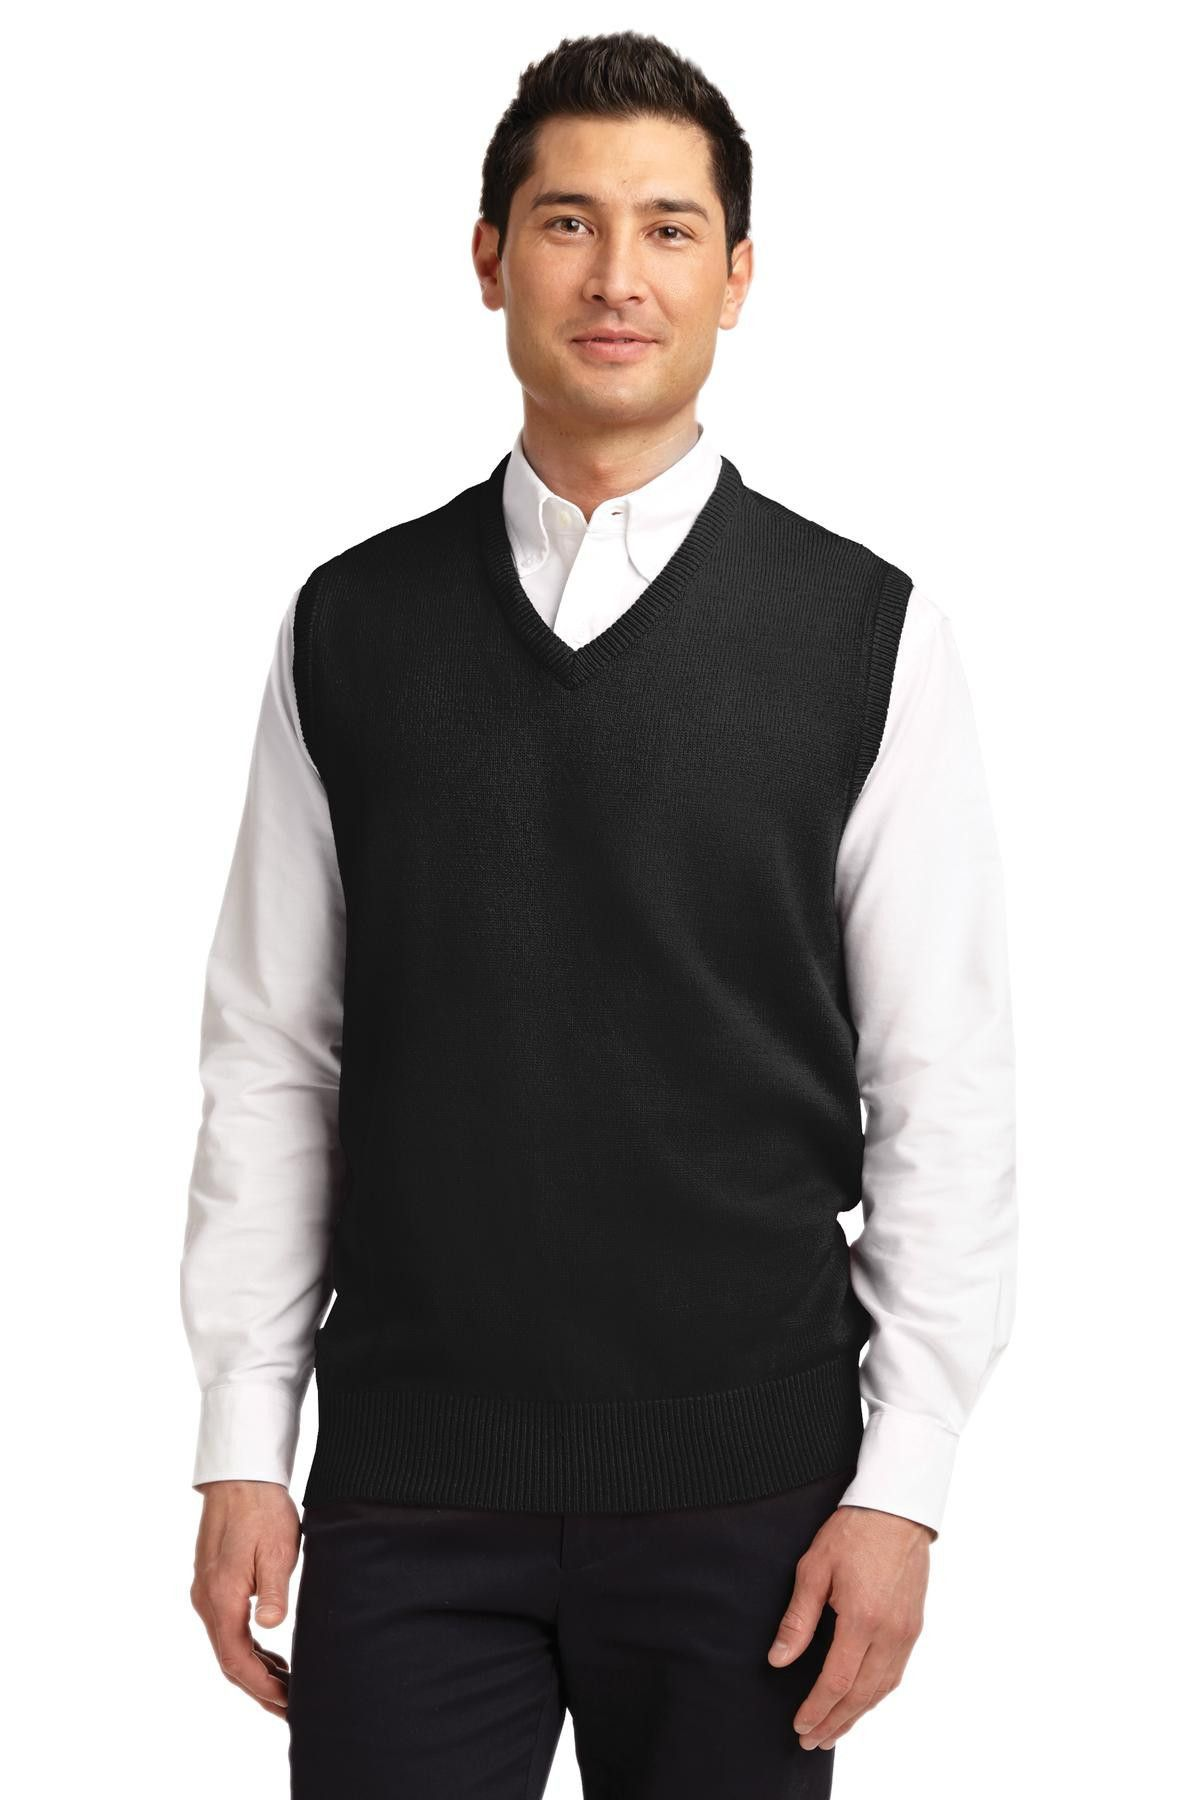 Port Authority Value V-Neck Sweater Vest SW301 Black | Cardigans ...